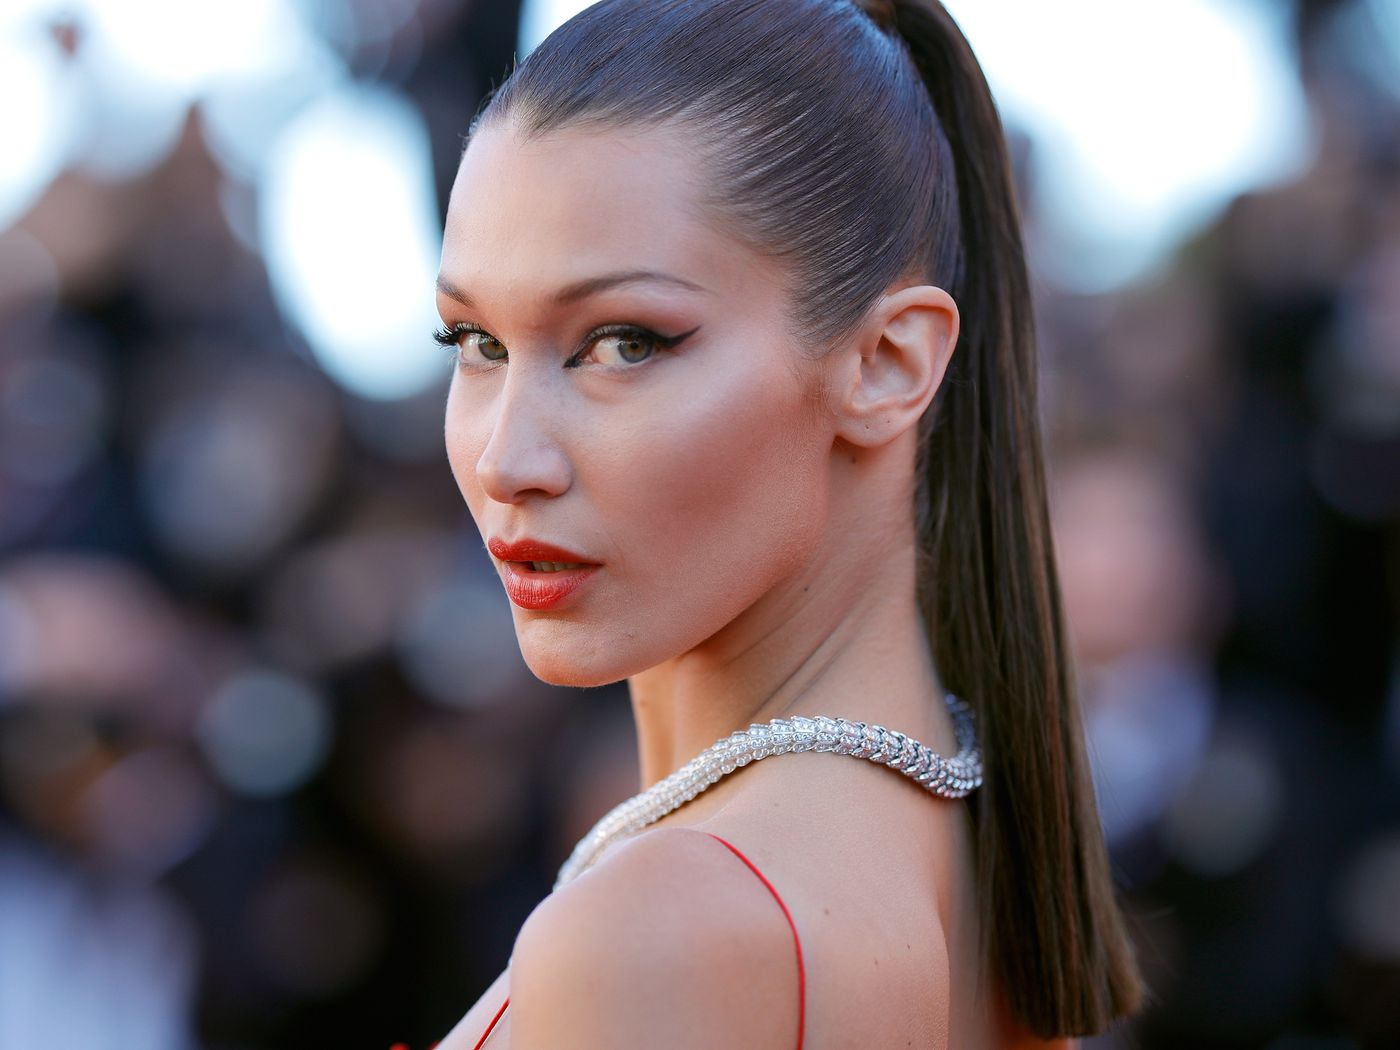 Have Bella Hadid Ariana Grande And Kylie Jenner Had Botox Brow Lifts Vox